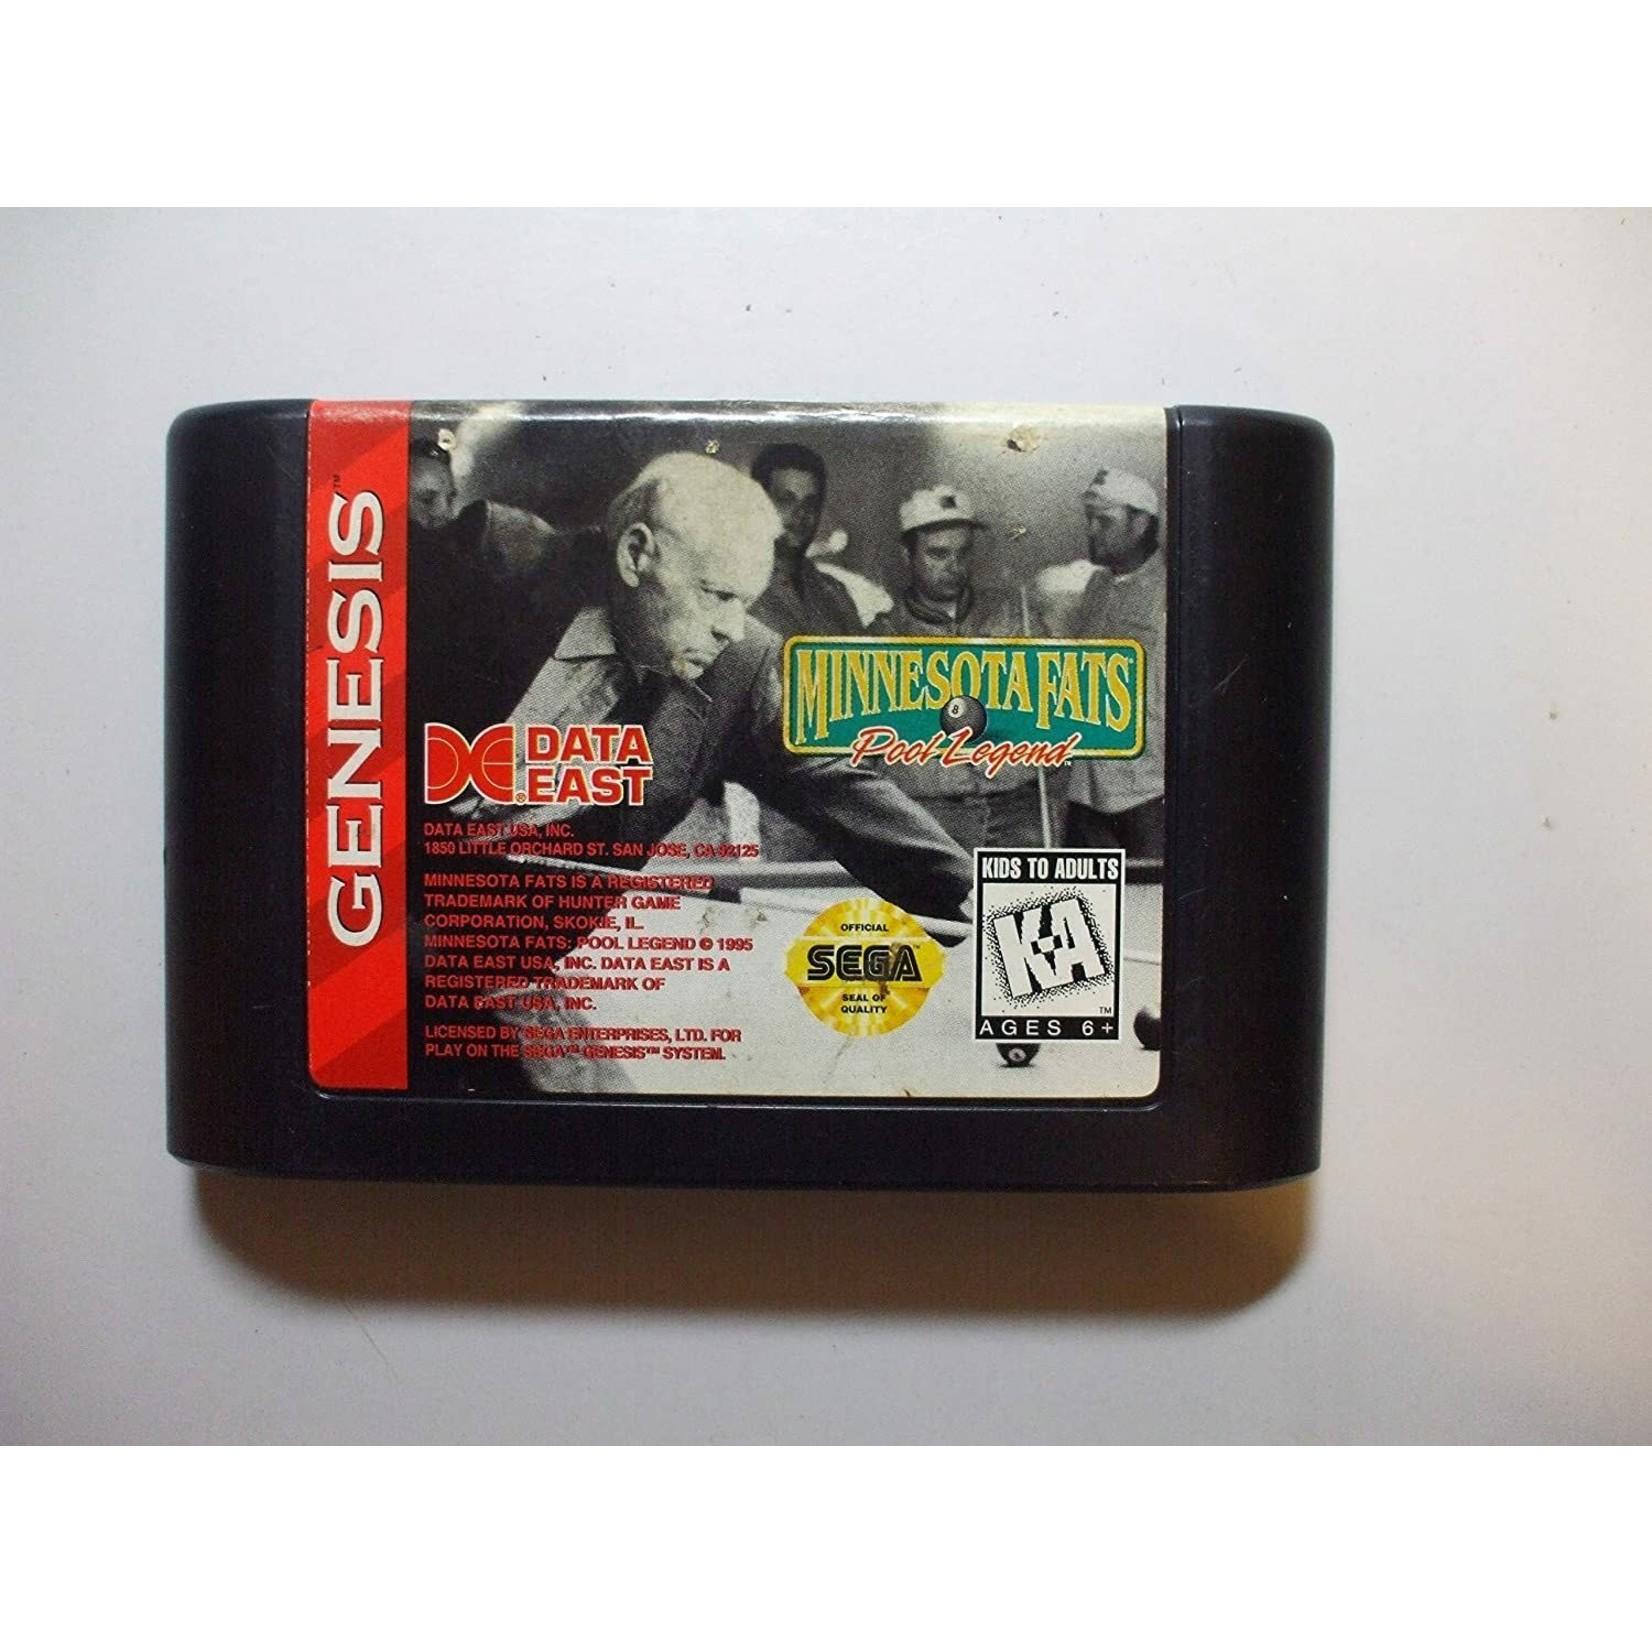 sgu-Minnesota Fats (cartridge)